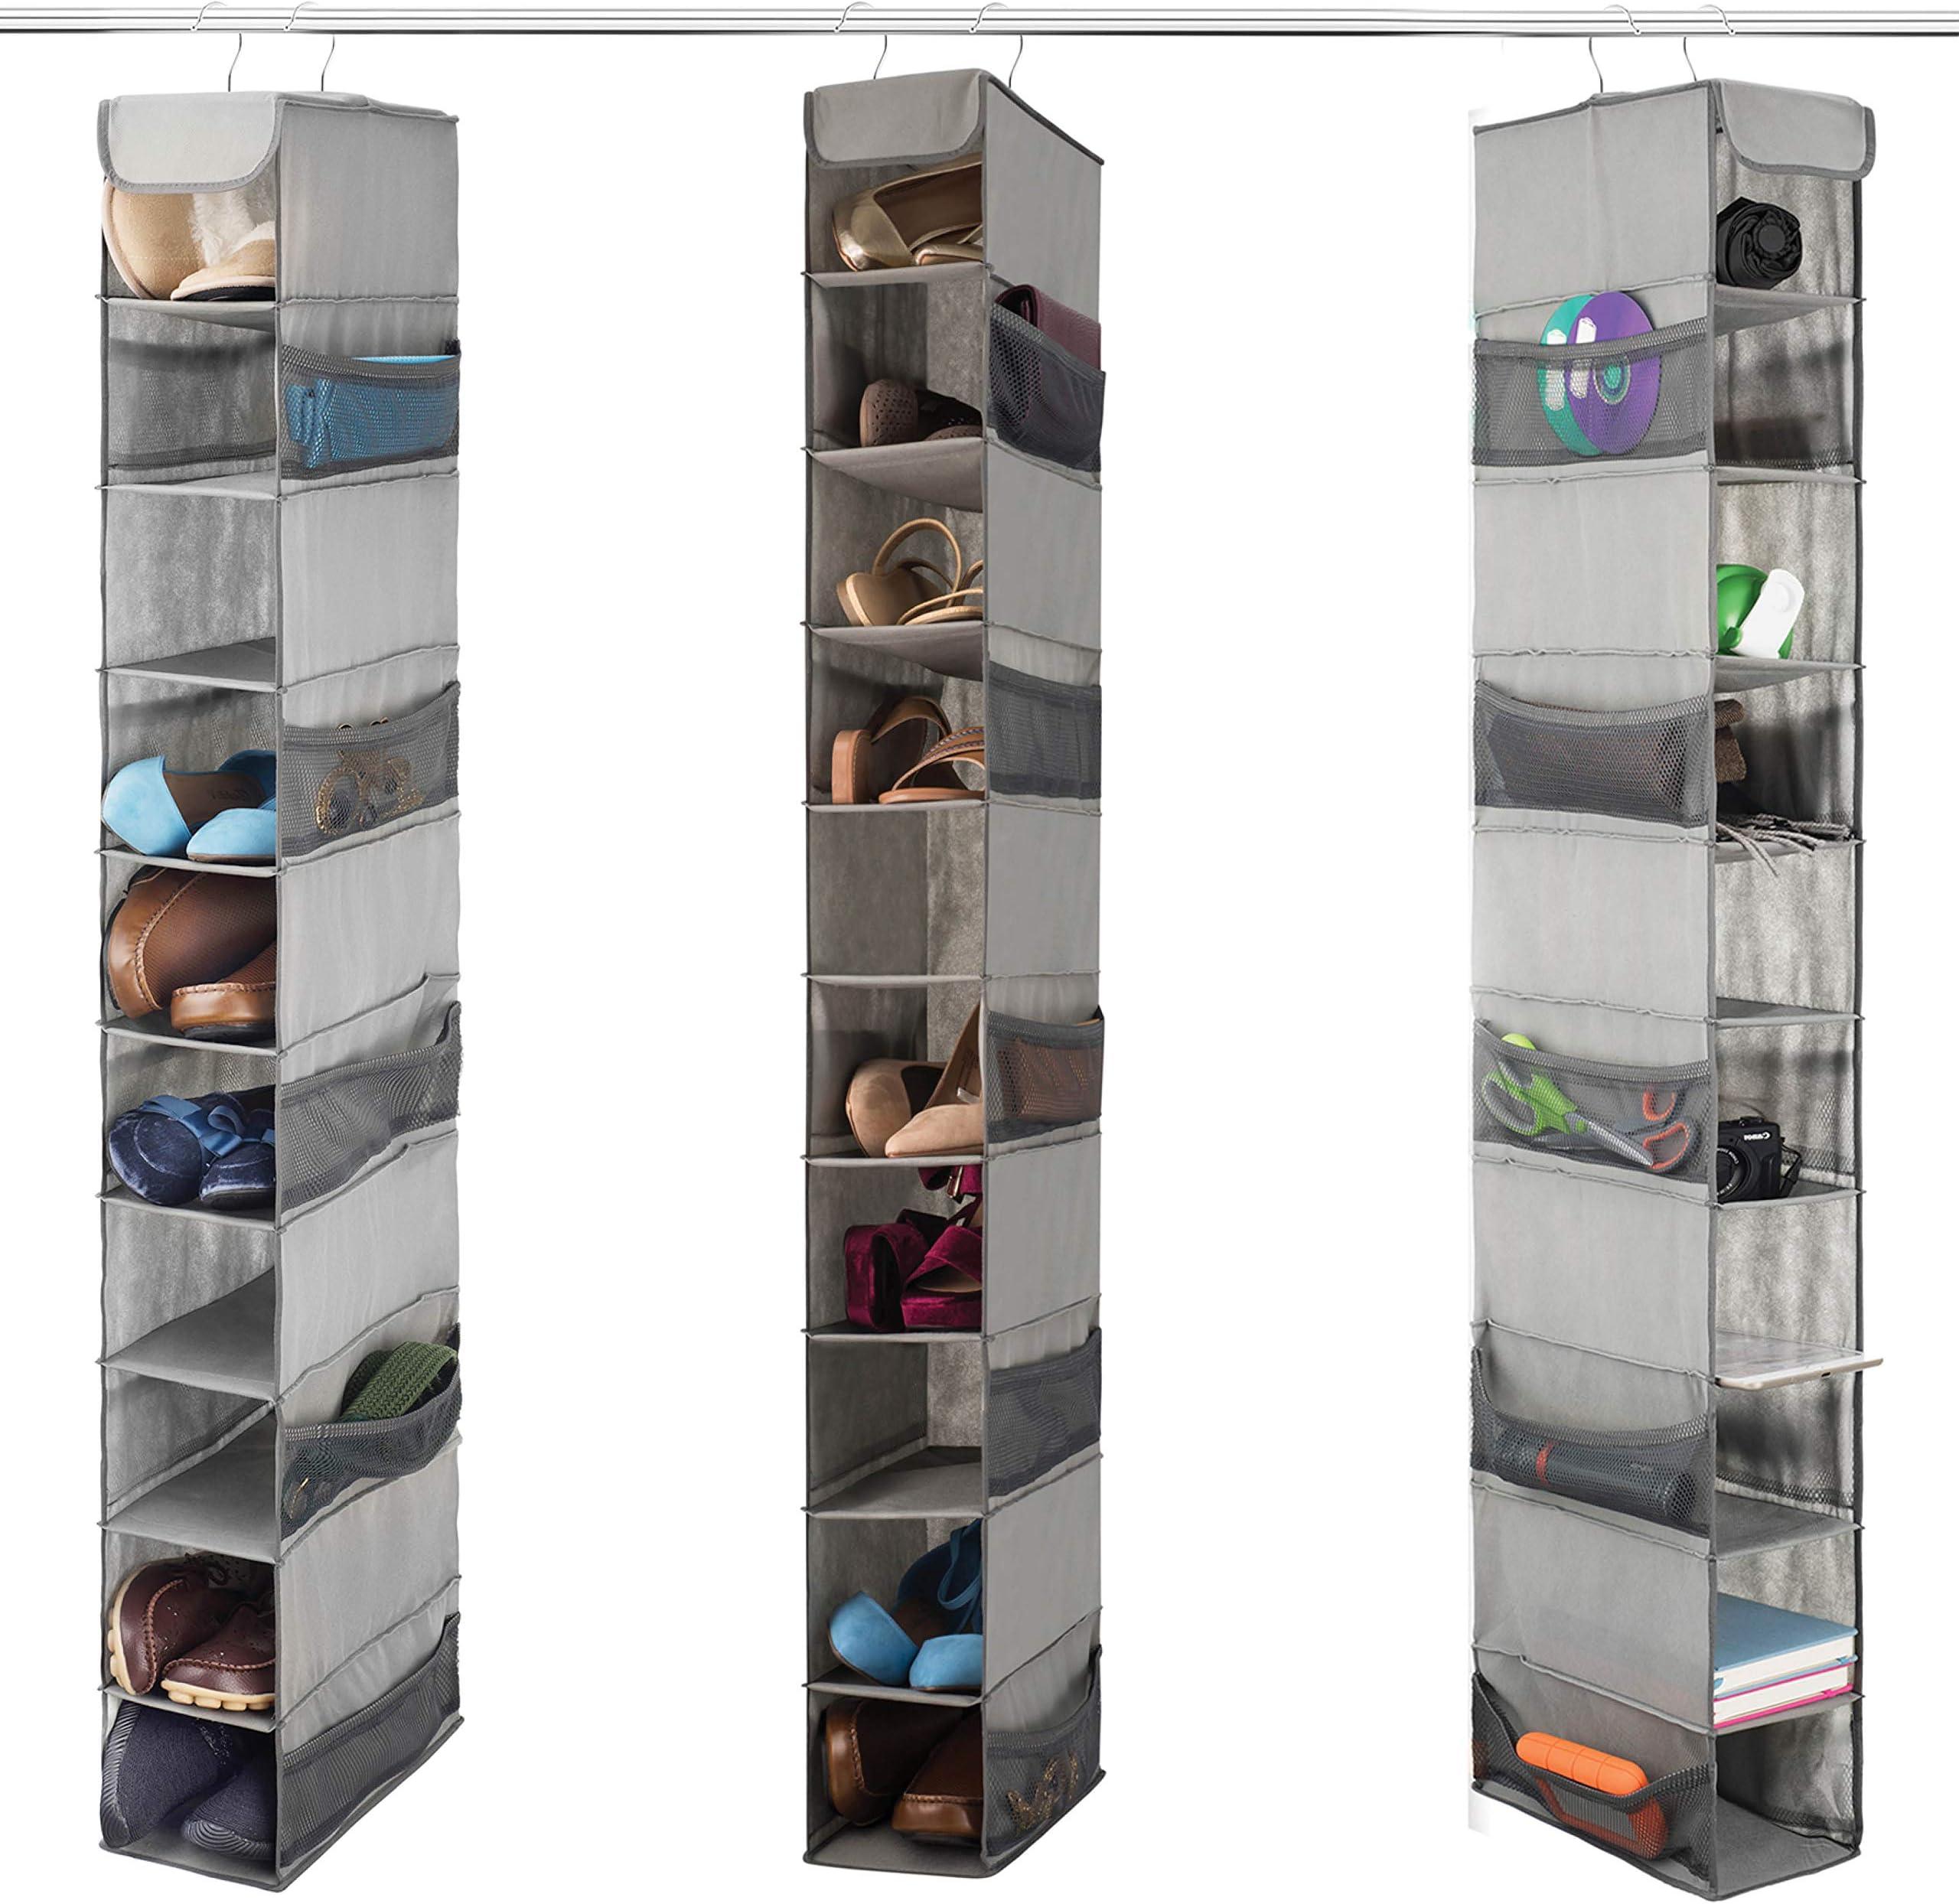 MISSLO 8-Shelf Hanging Wardrobe Storage Organiser Clothes Storage Shelves Hat Holder with Large Shelf and Side Mesh Pockets for Hats Handbags Kid Sweater Grey